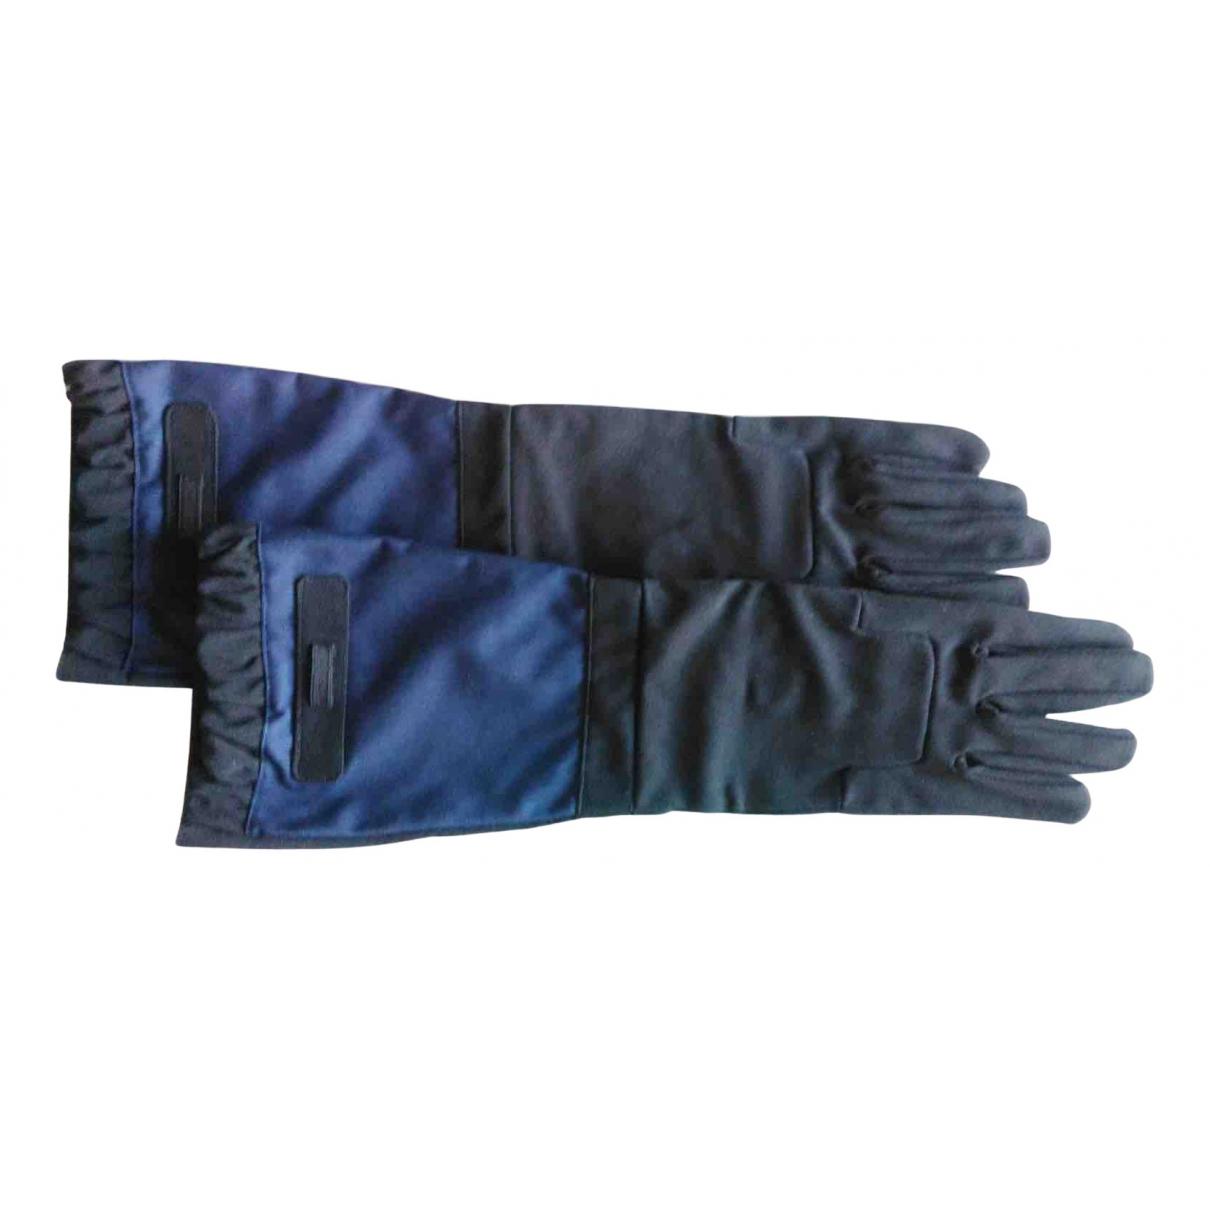 Prada N Black Gloves for Men 8.5 - 9 Inches